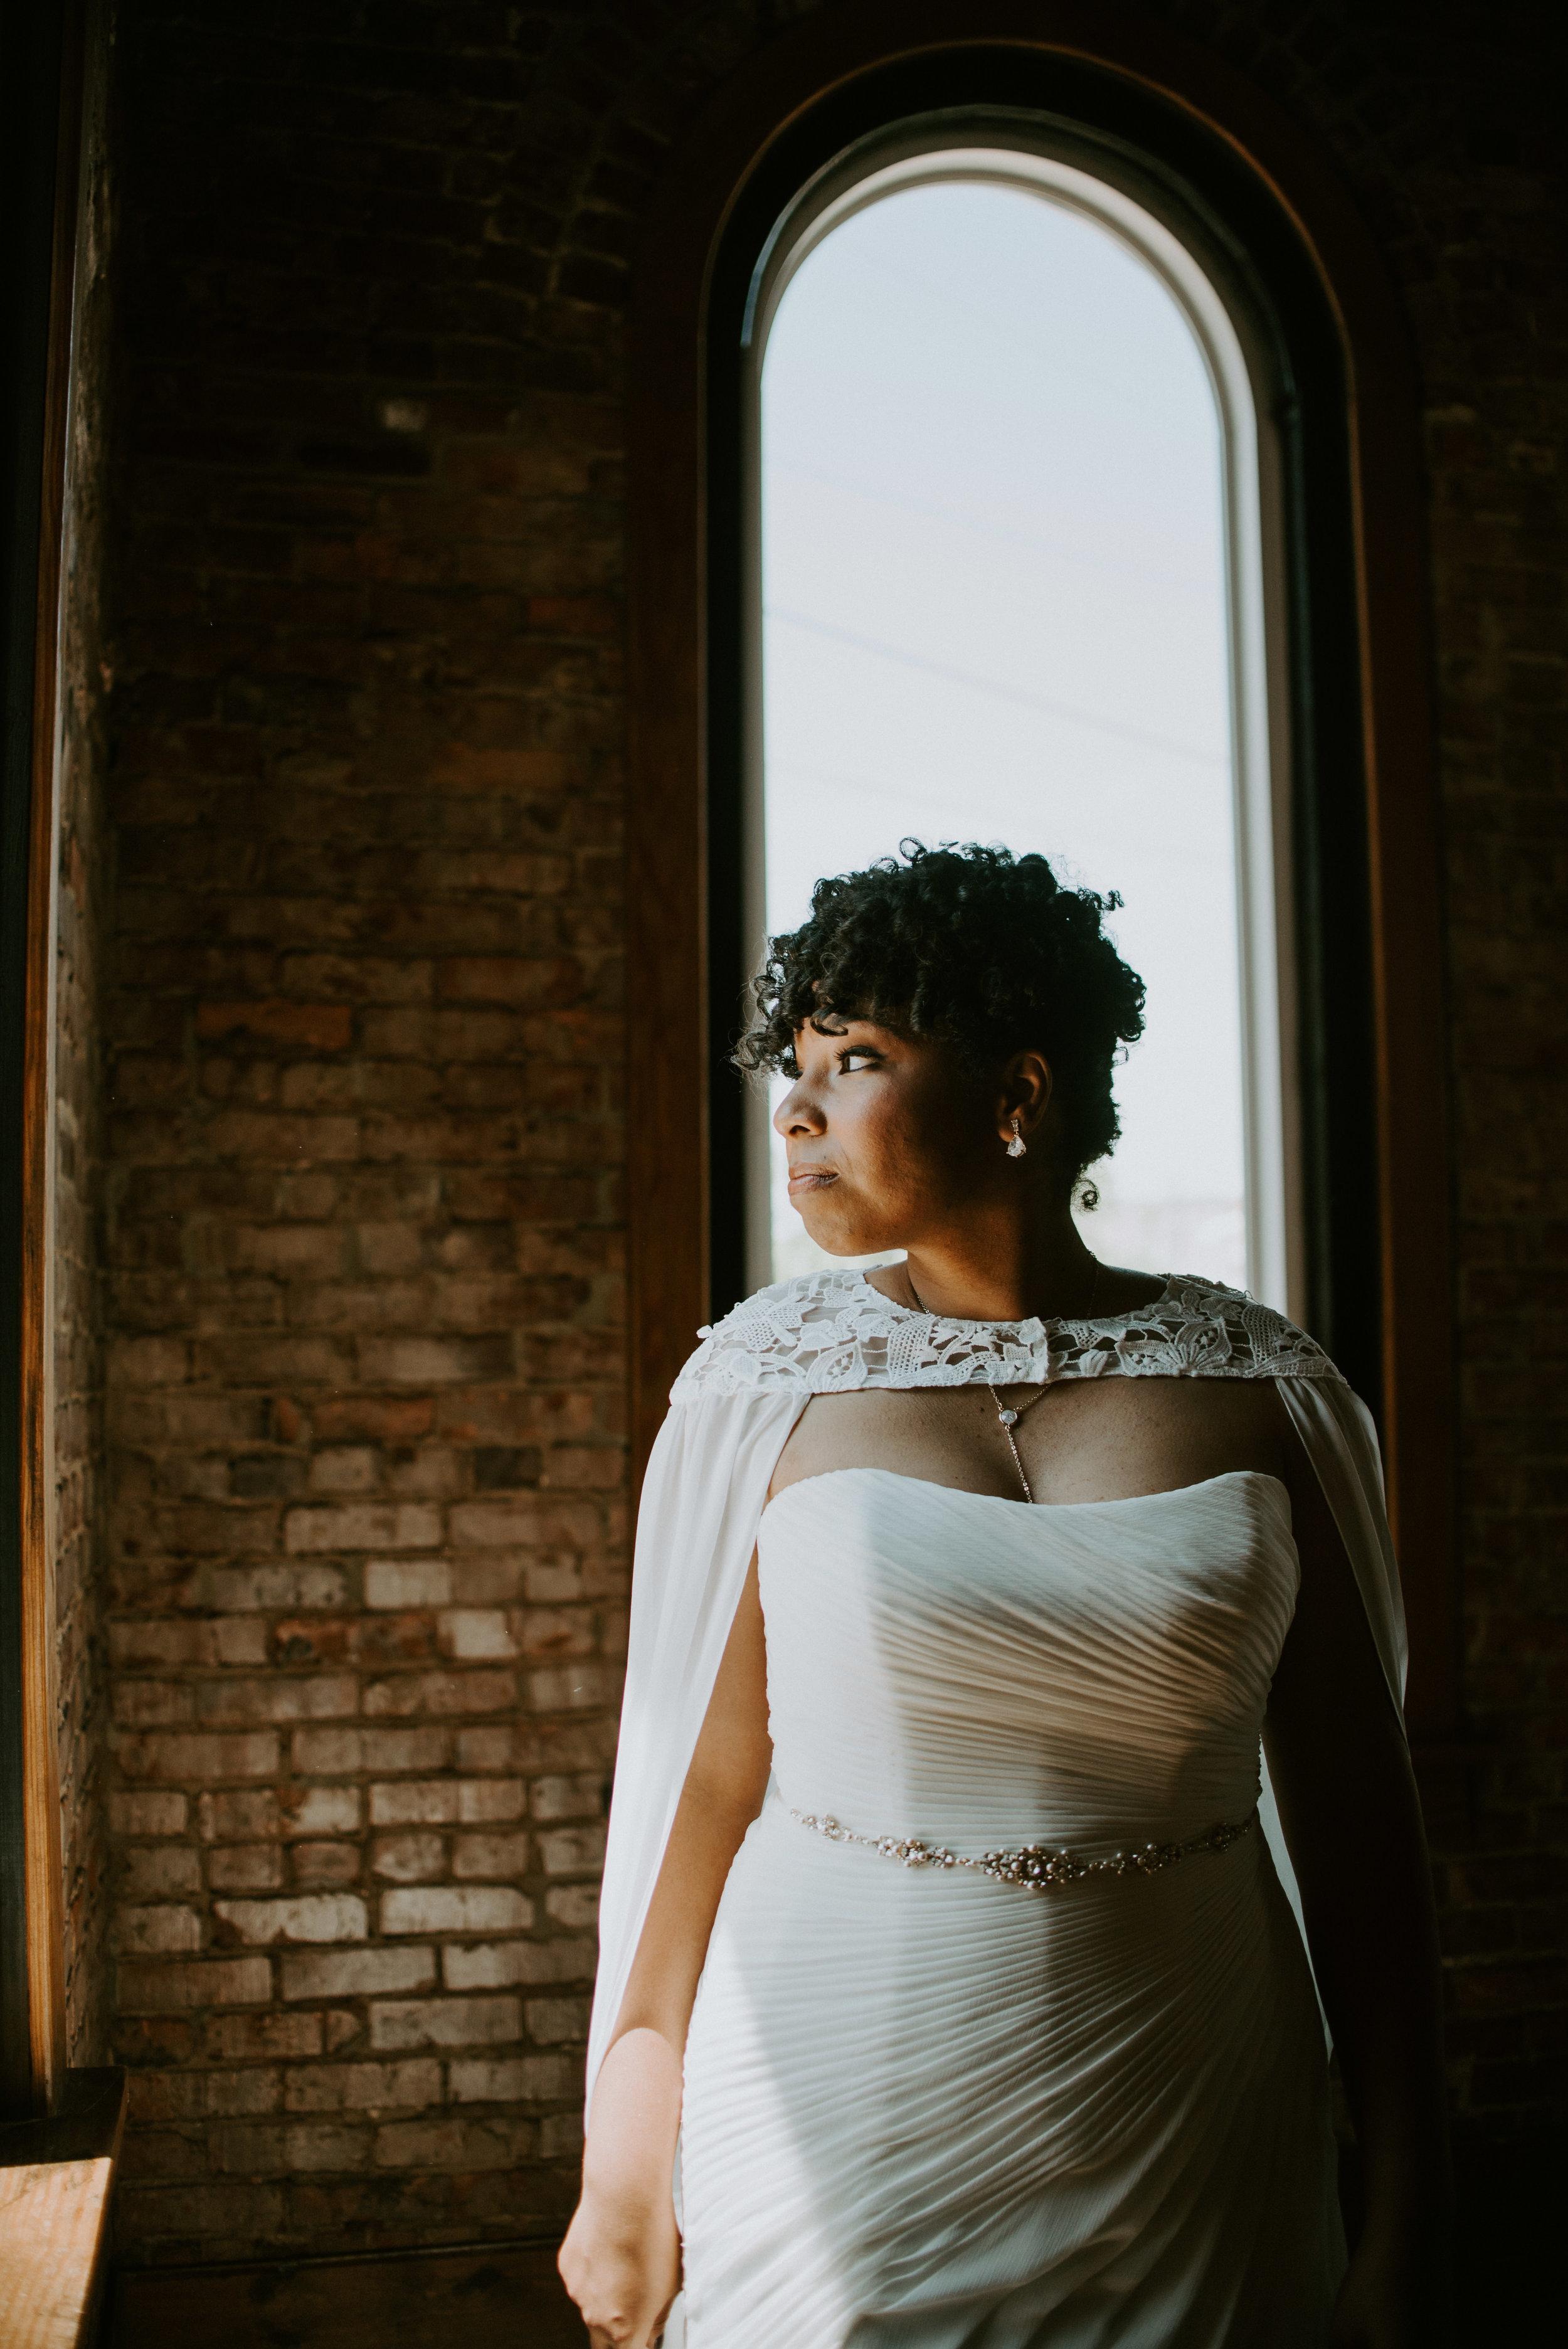 WonderlyCreative_Wedding_6.7.18_Khara&Dwayne_-234.jpg